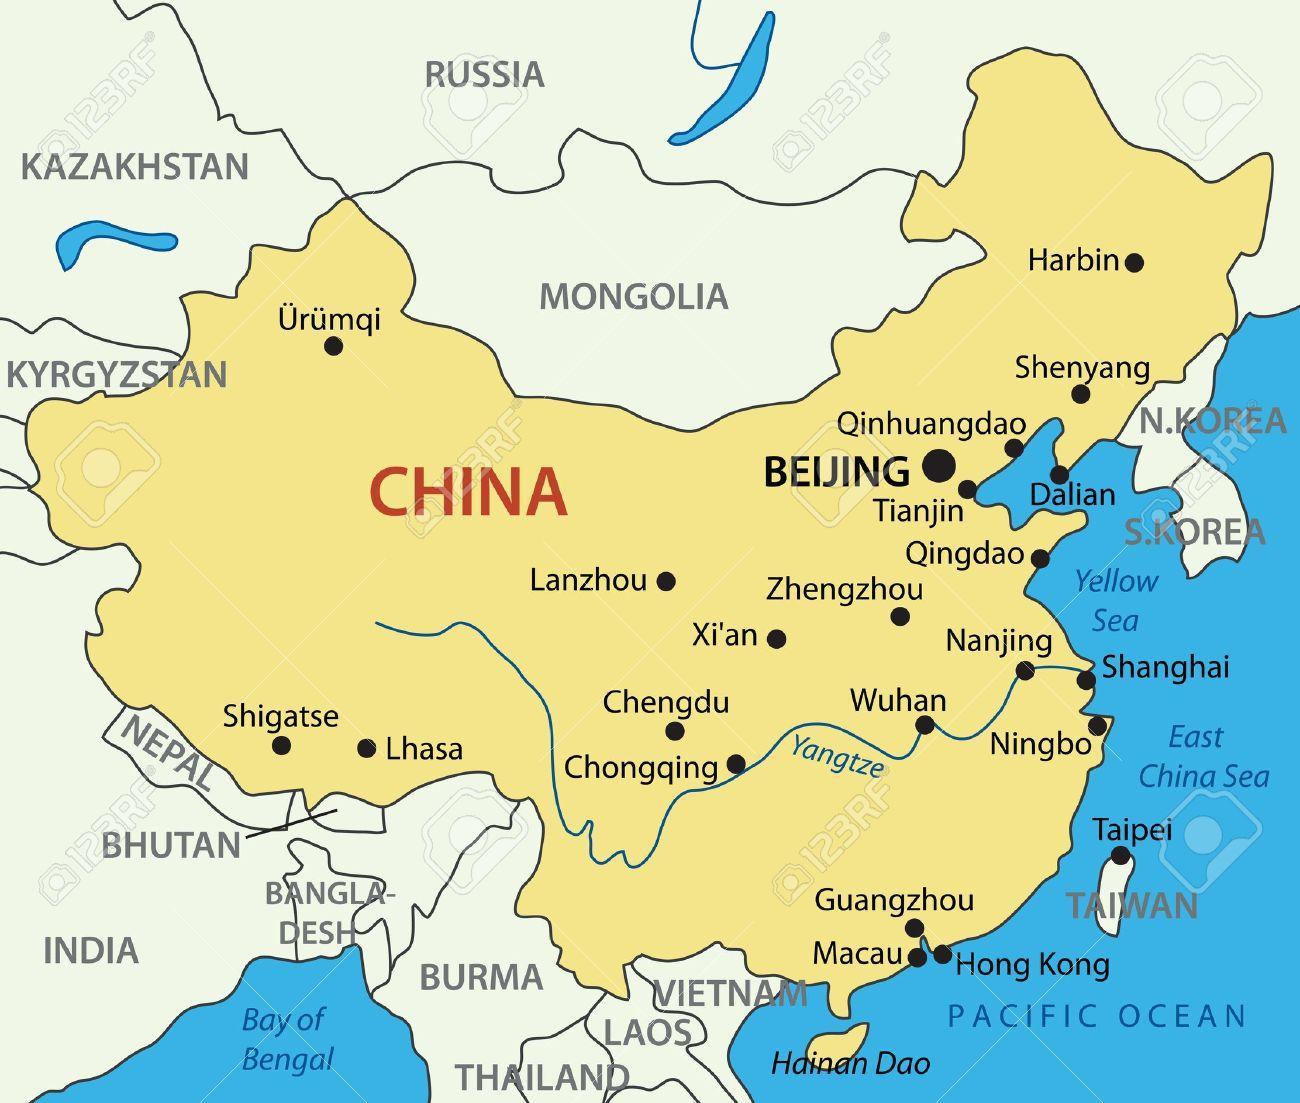 Kort Over Kina Gule Hav Gule Hav Kina Kort Ostlige Asien Asien